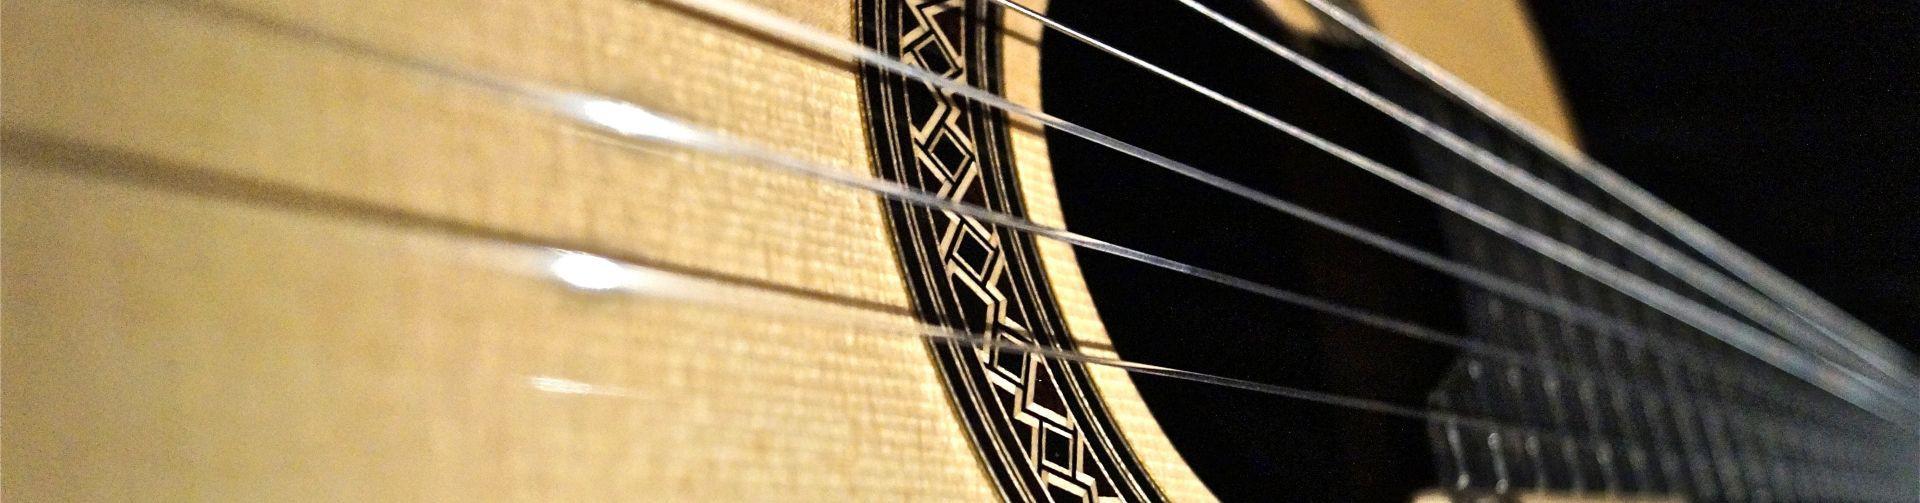 Óptimas condiciones acústicas para probar guitarras